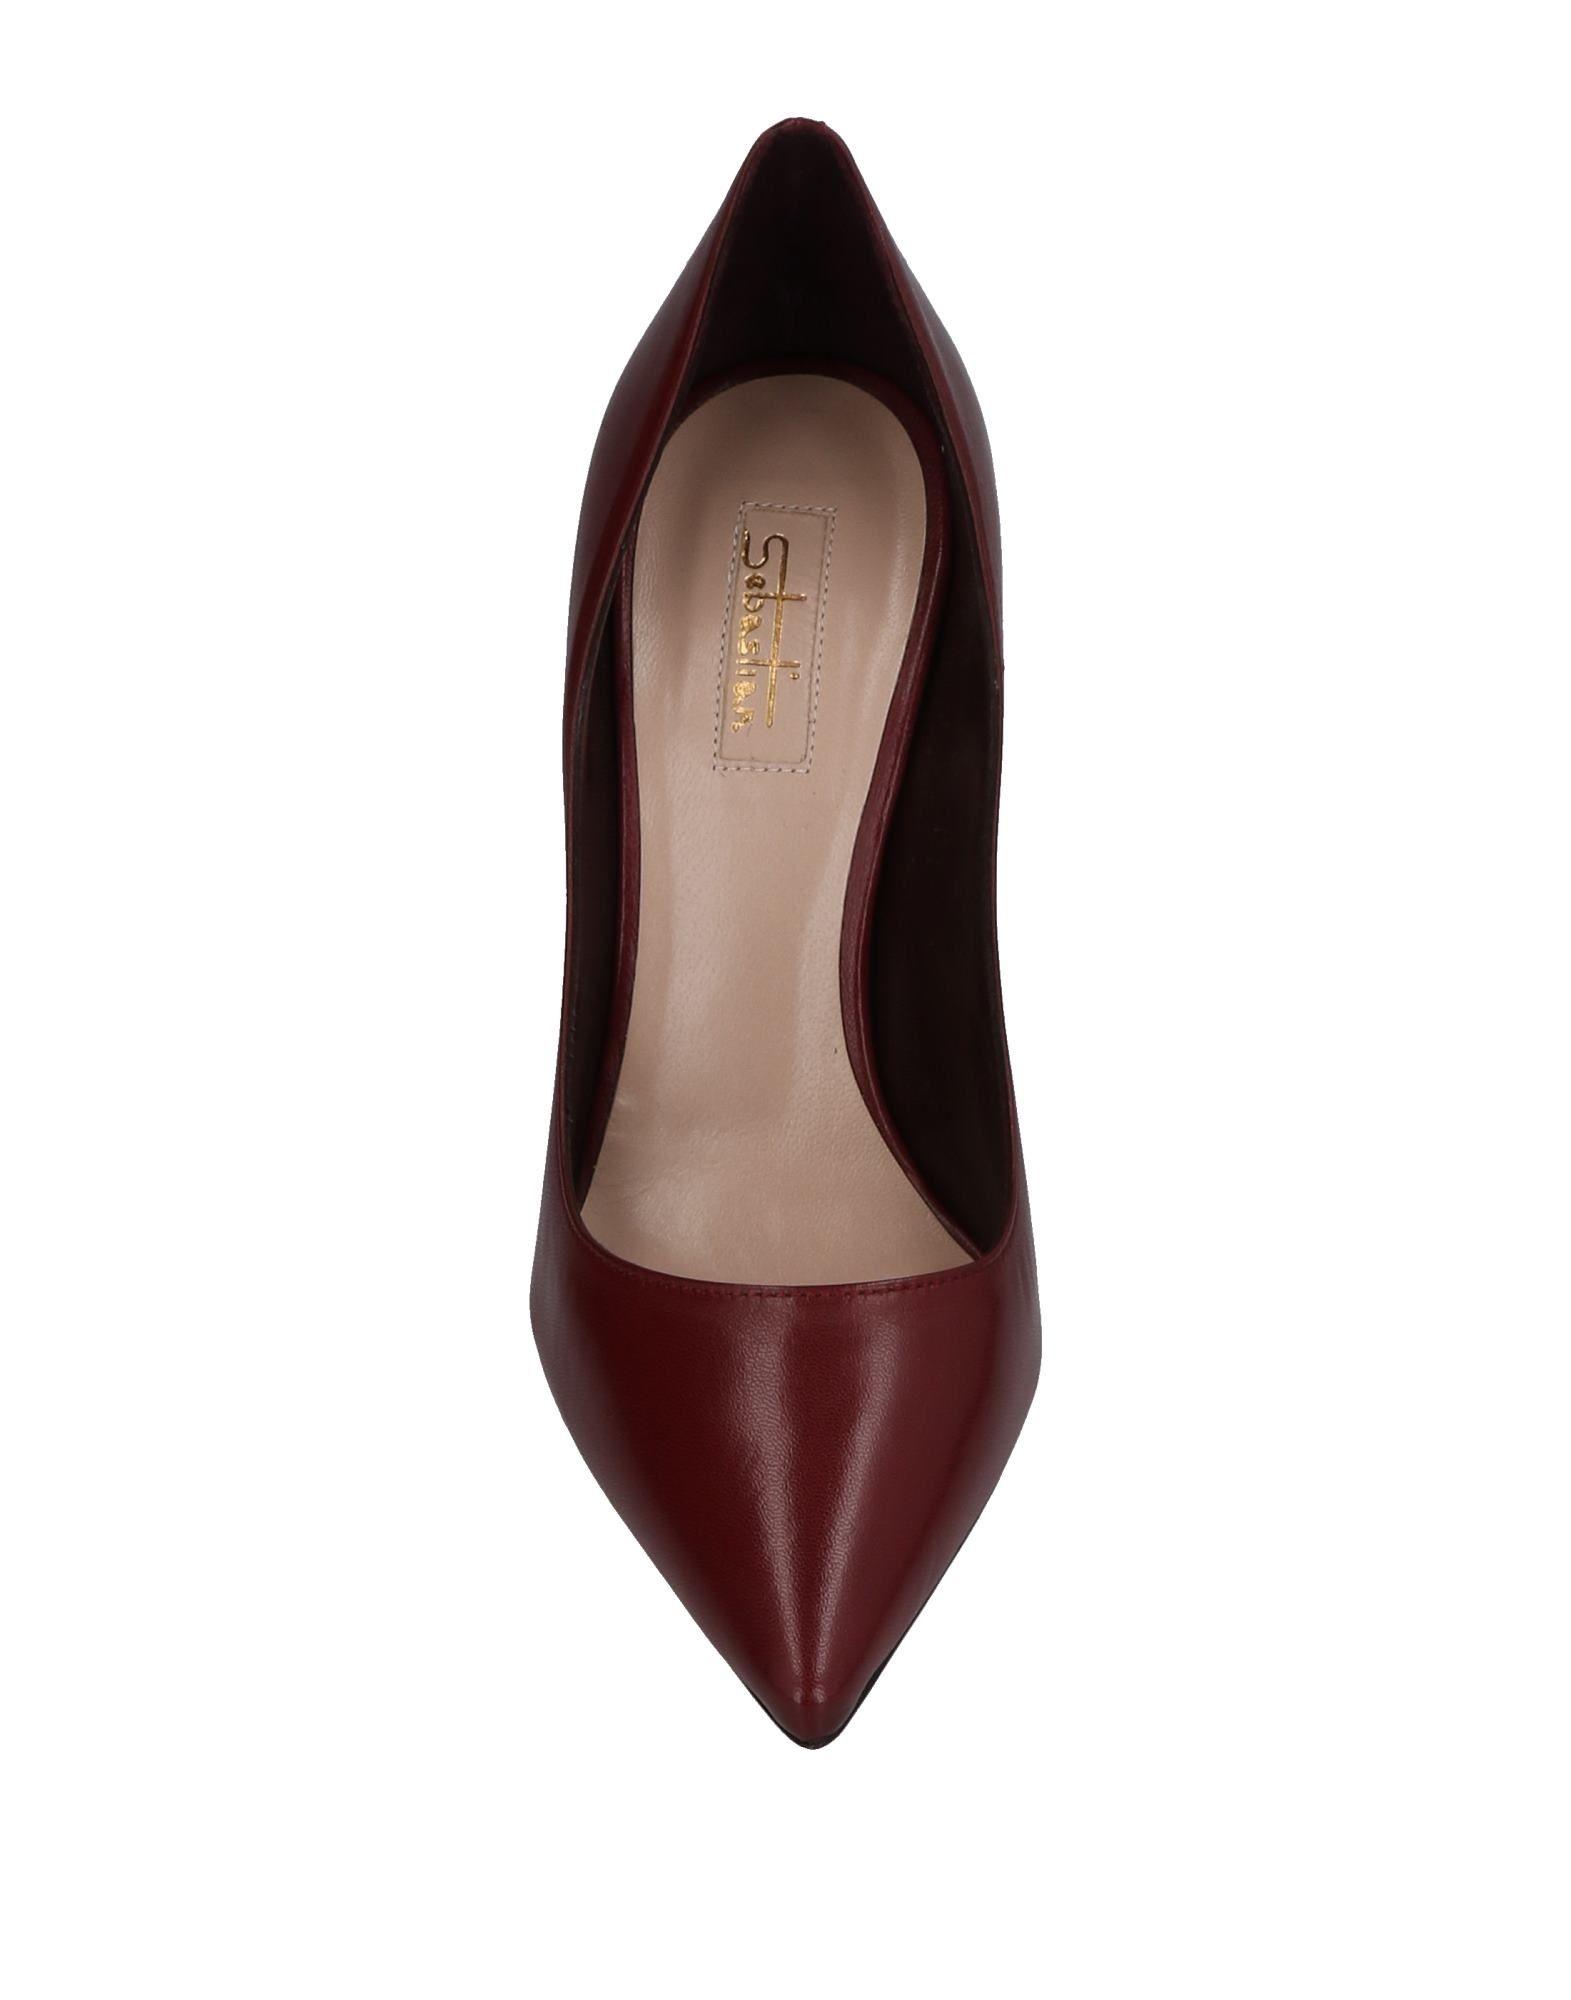 Sebastian Pumps Damen  11445739MHGut Schuhe aussehende strapazierfähige Schuhe 11445739MHGut acb236